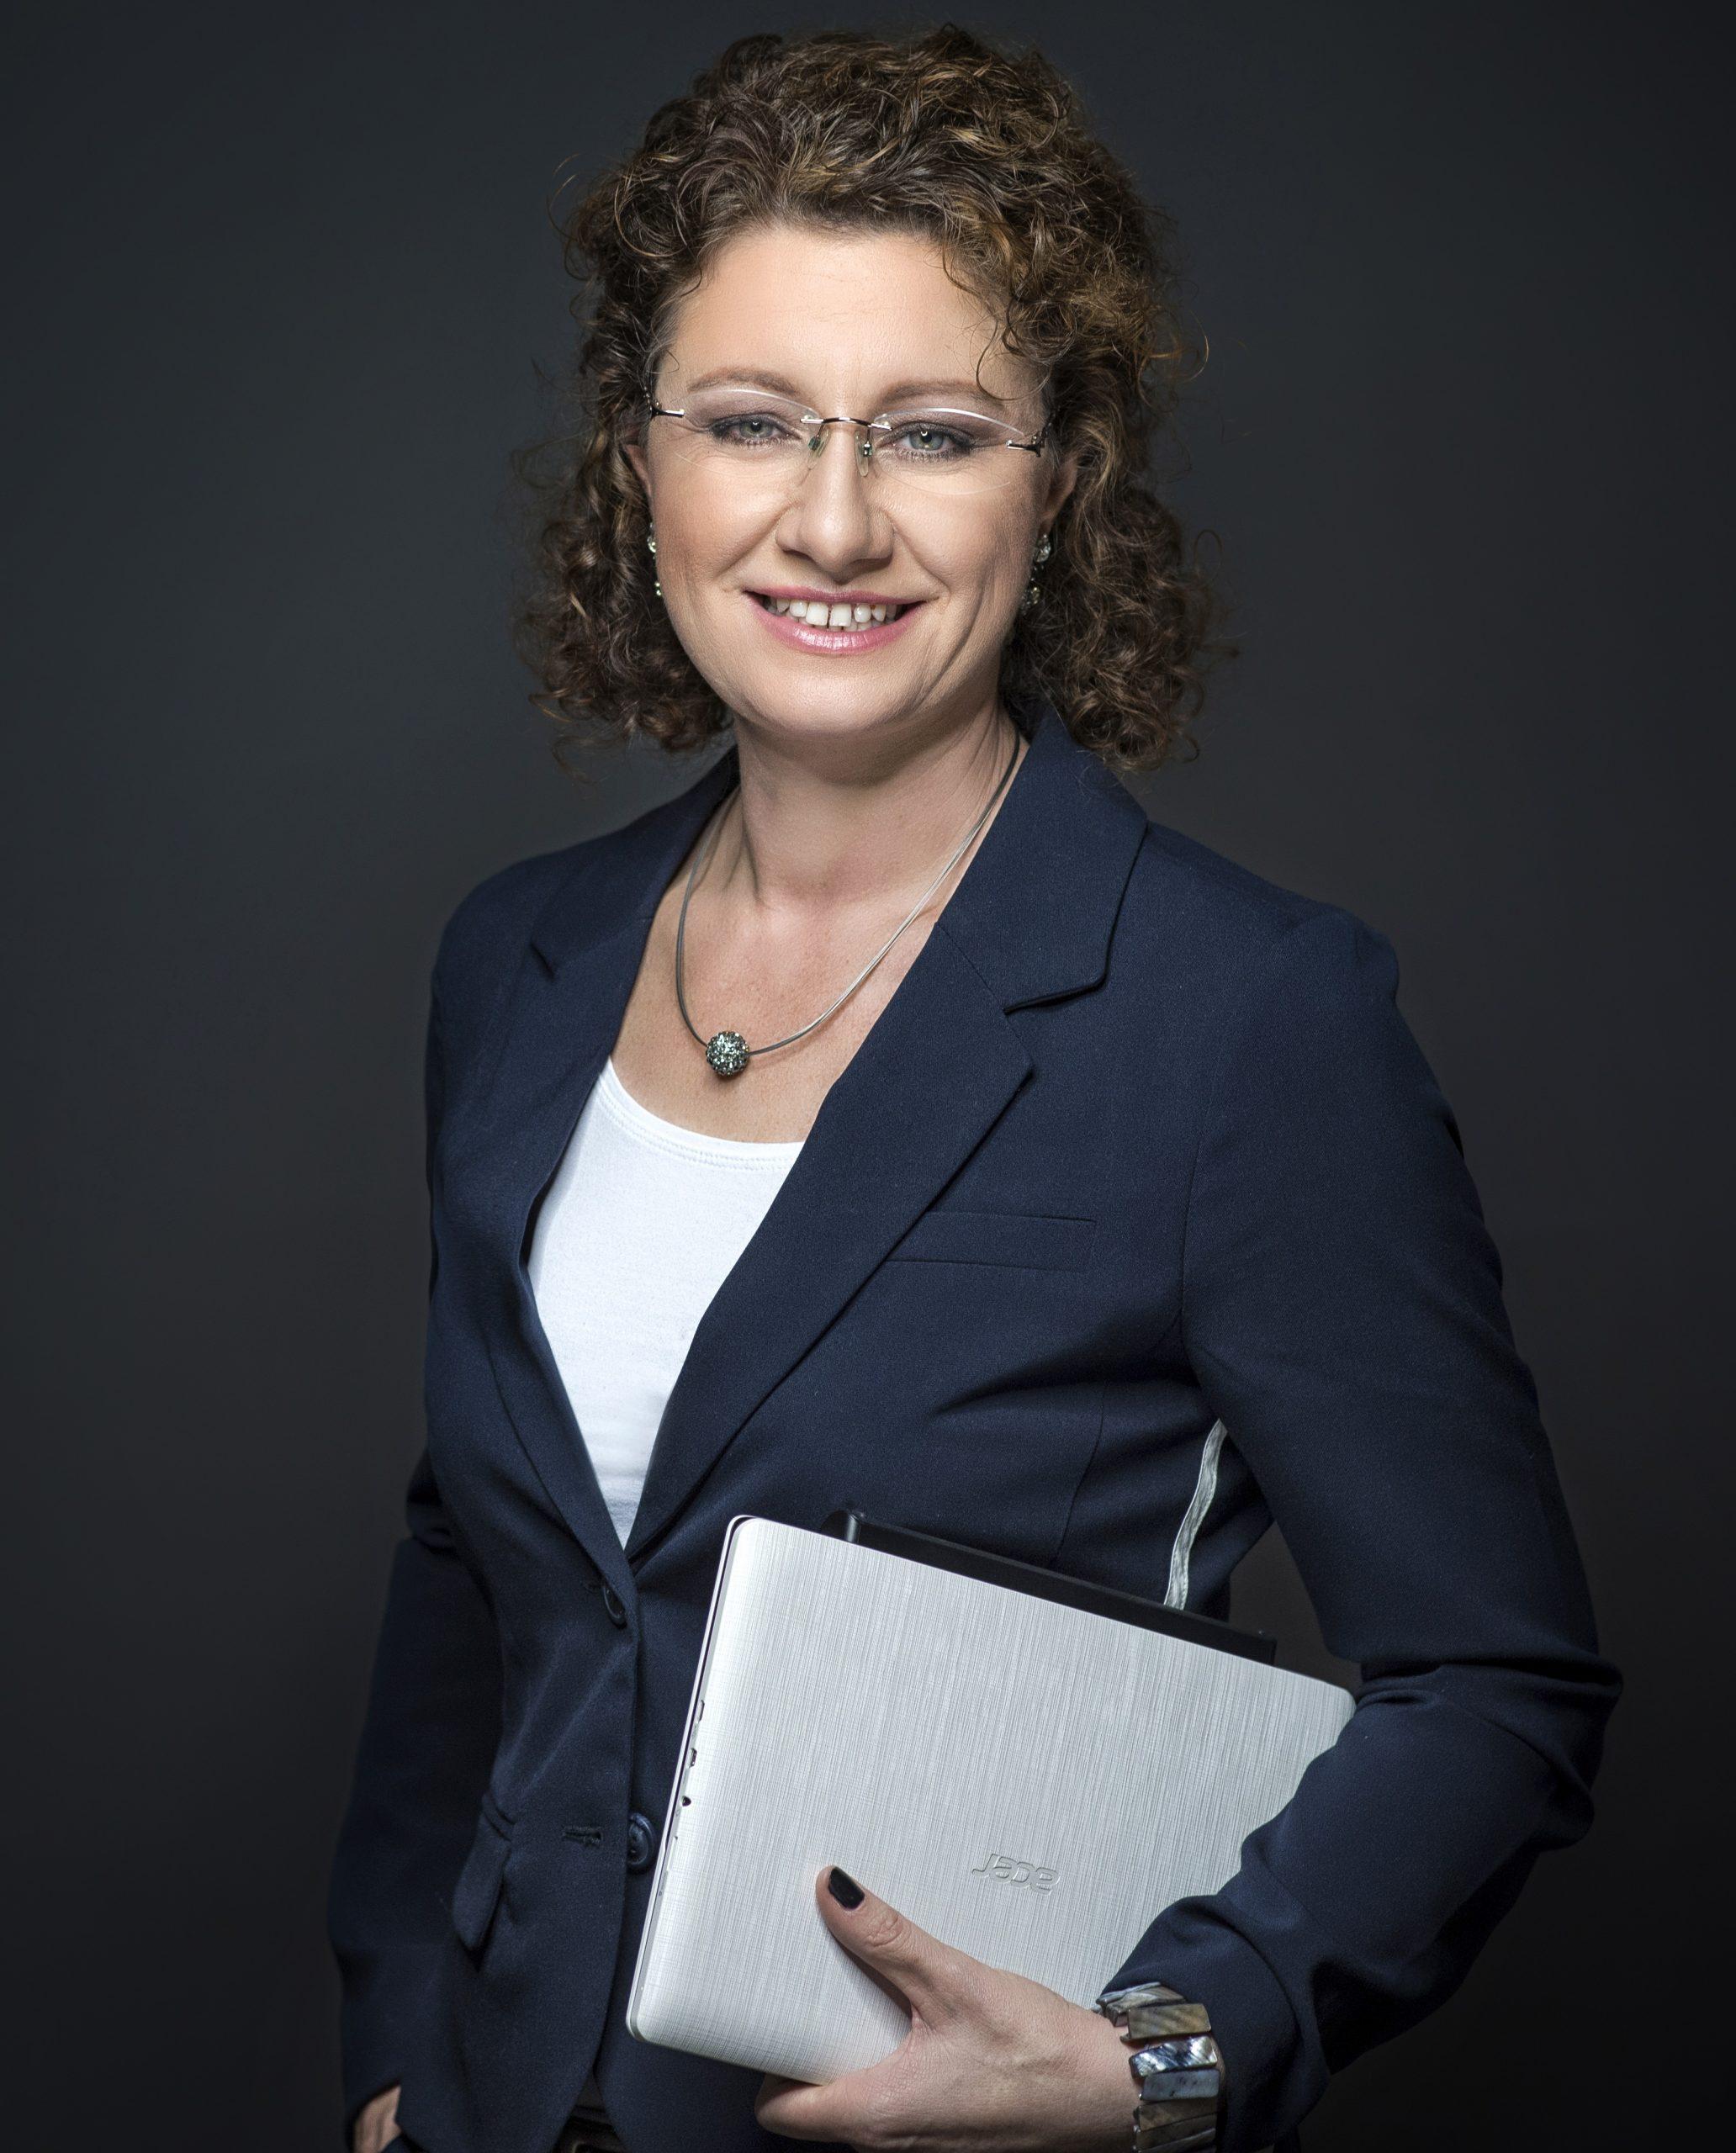 Verena Hübenthal